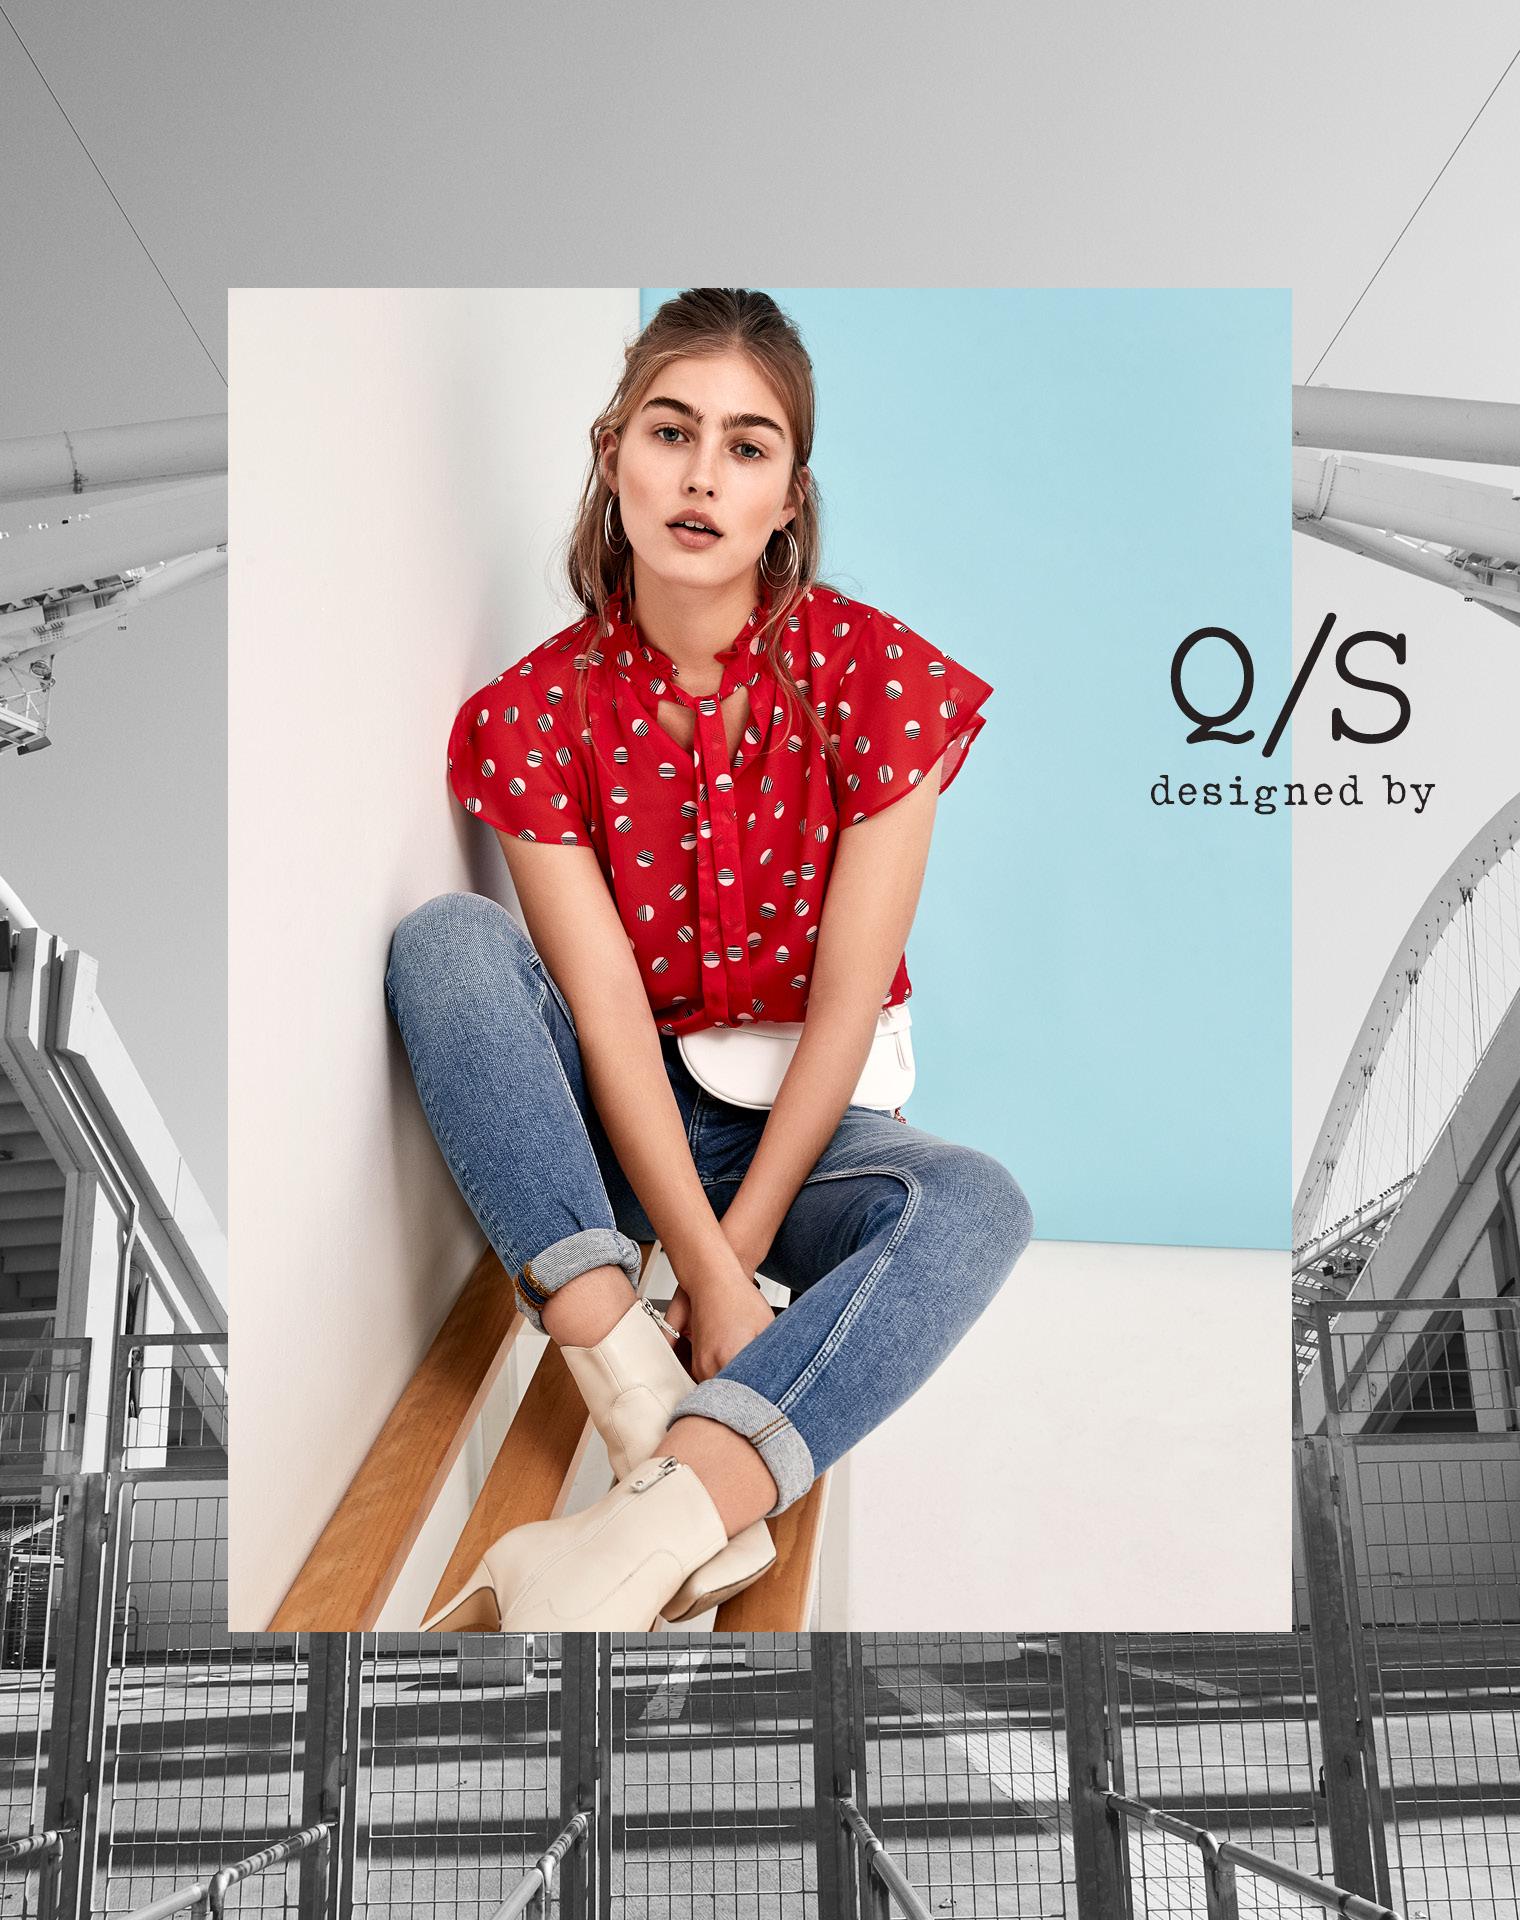 QS-designed_spring_summer_2020_original_Imageteaser_QS_SS2020_001-003_1520x1920px_507